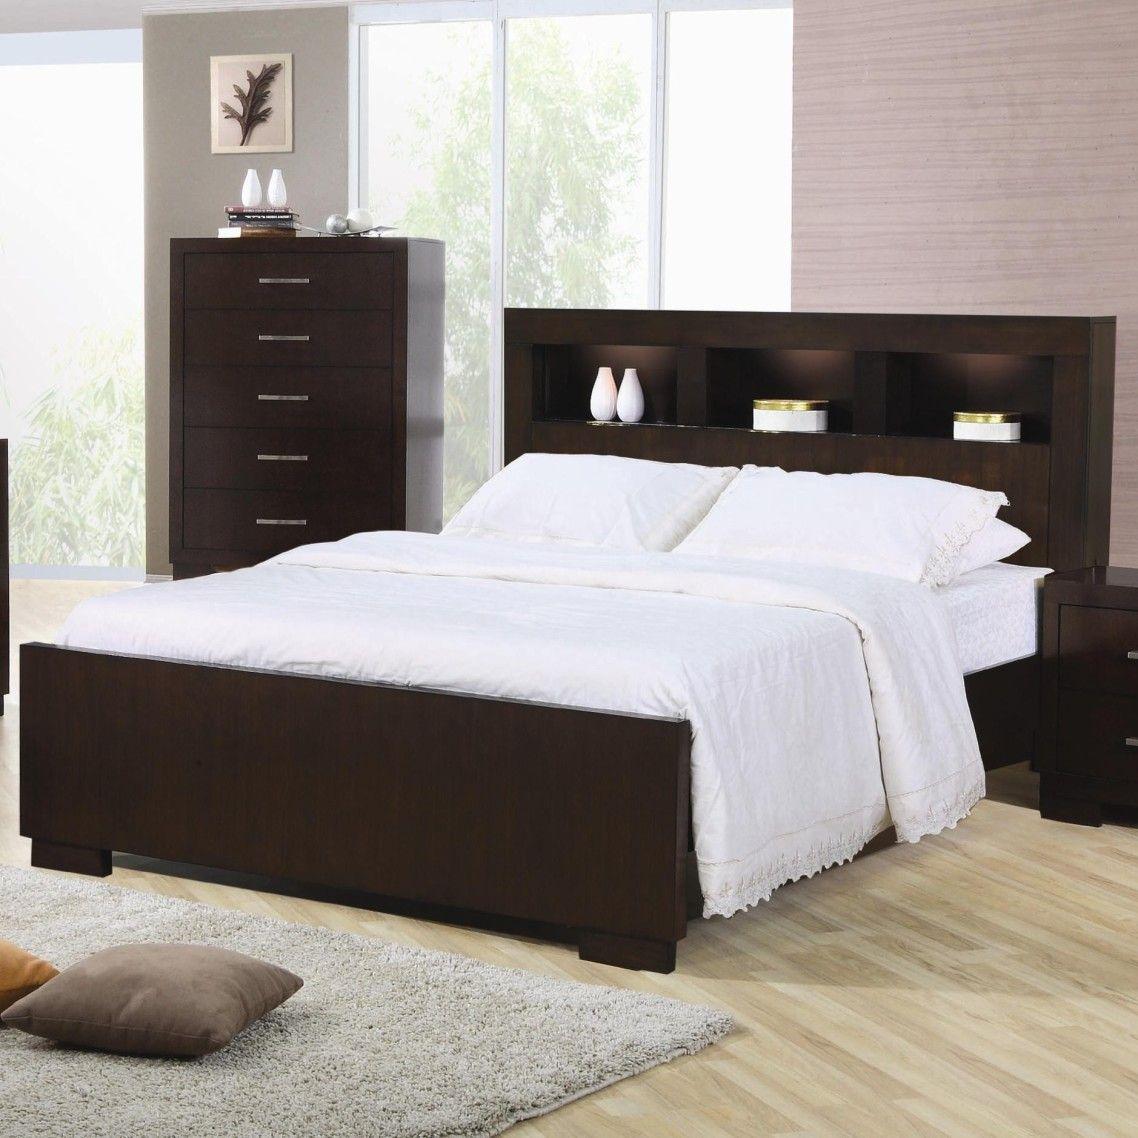 Furnitureplatformbedframecontemporarybedroomcontemporary